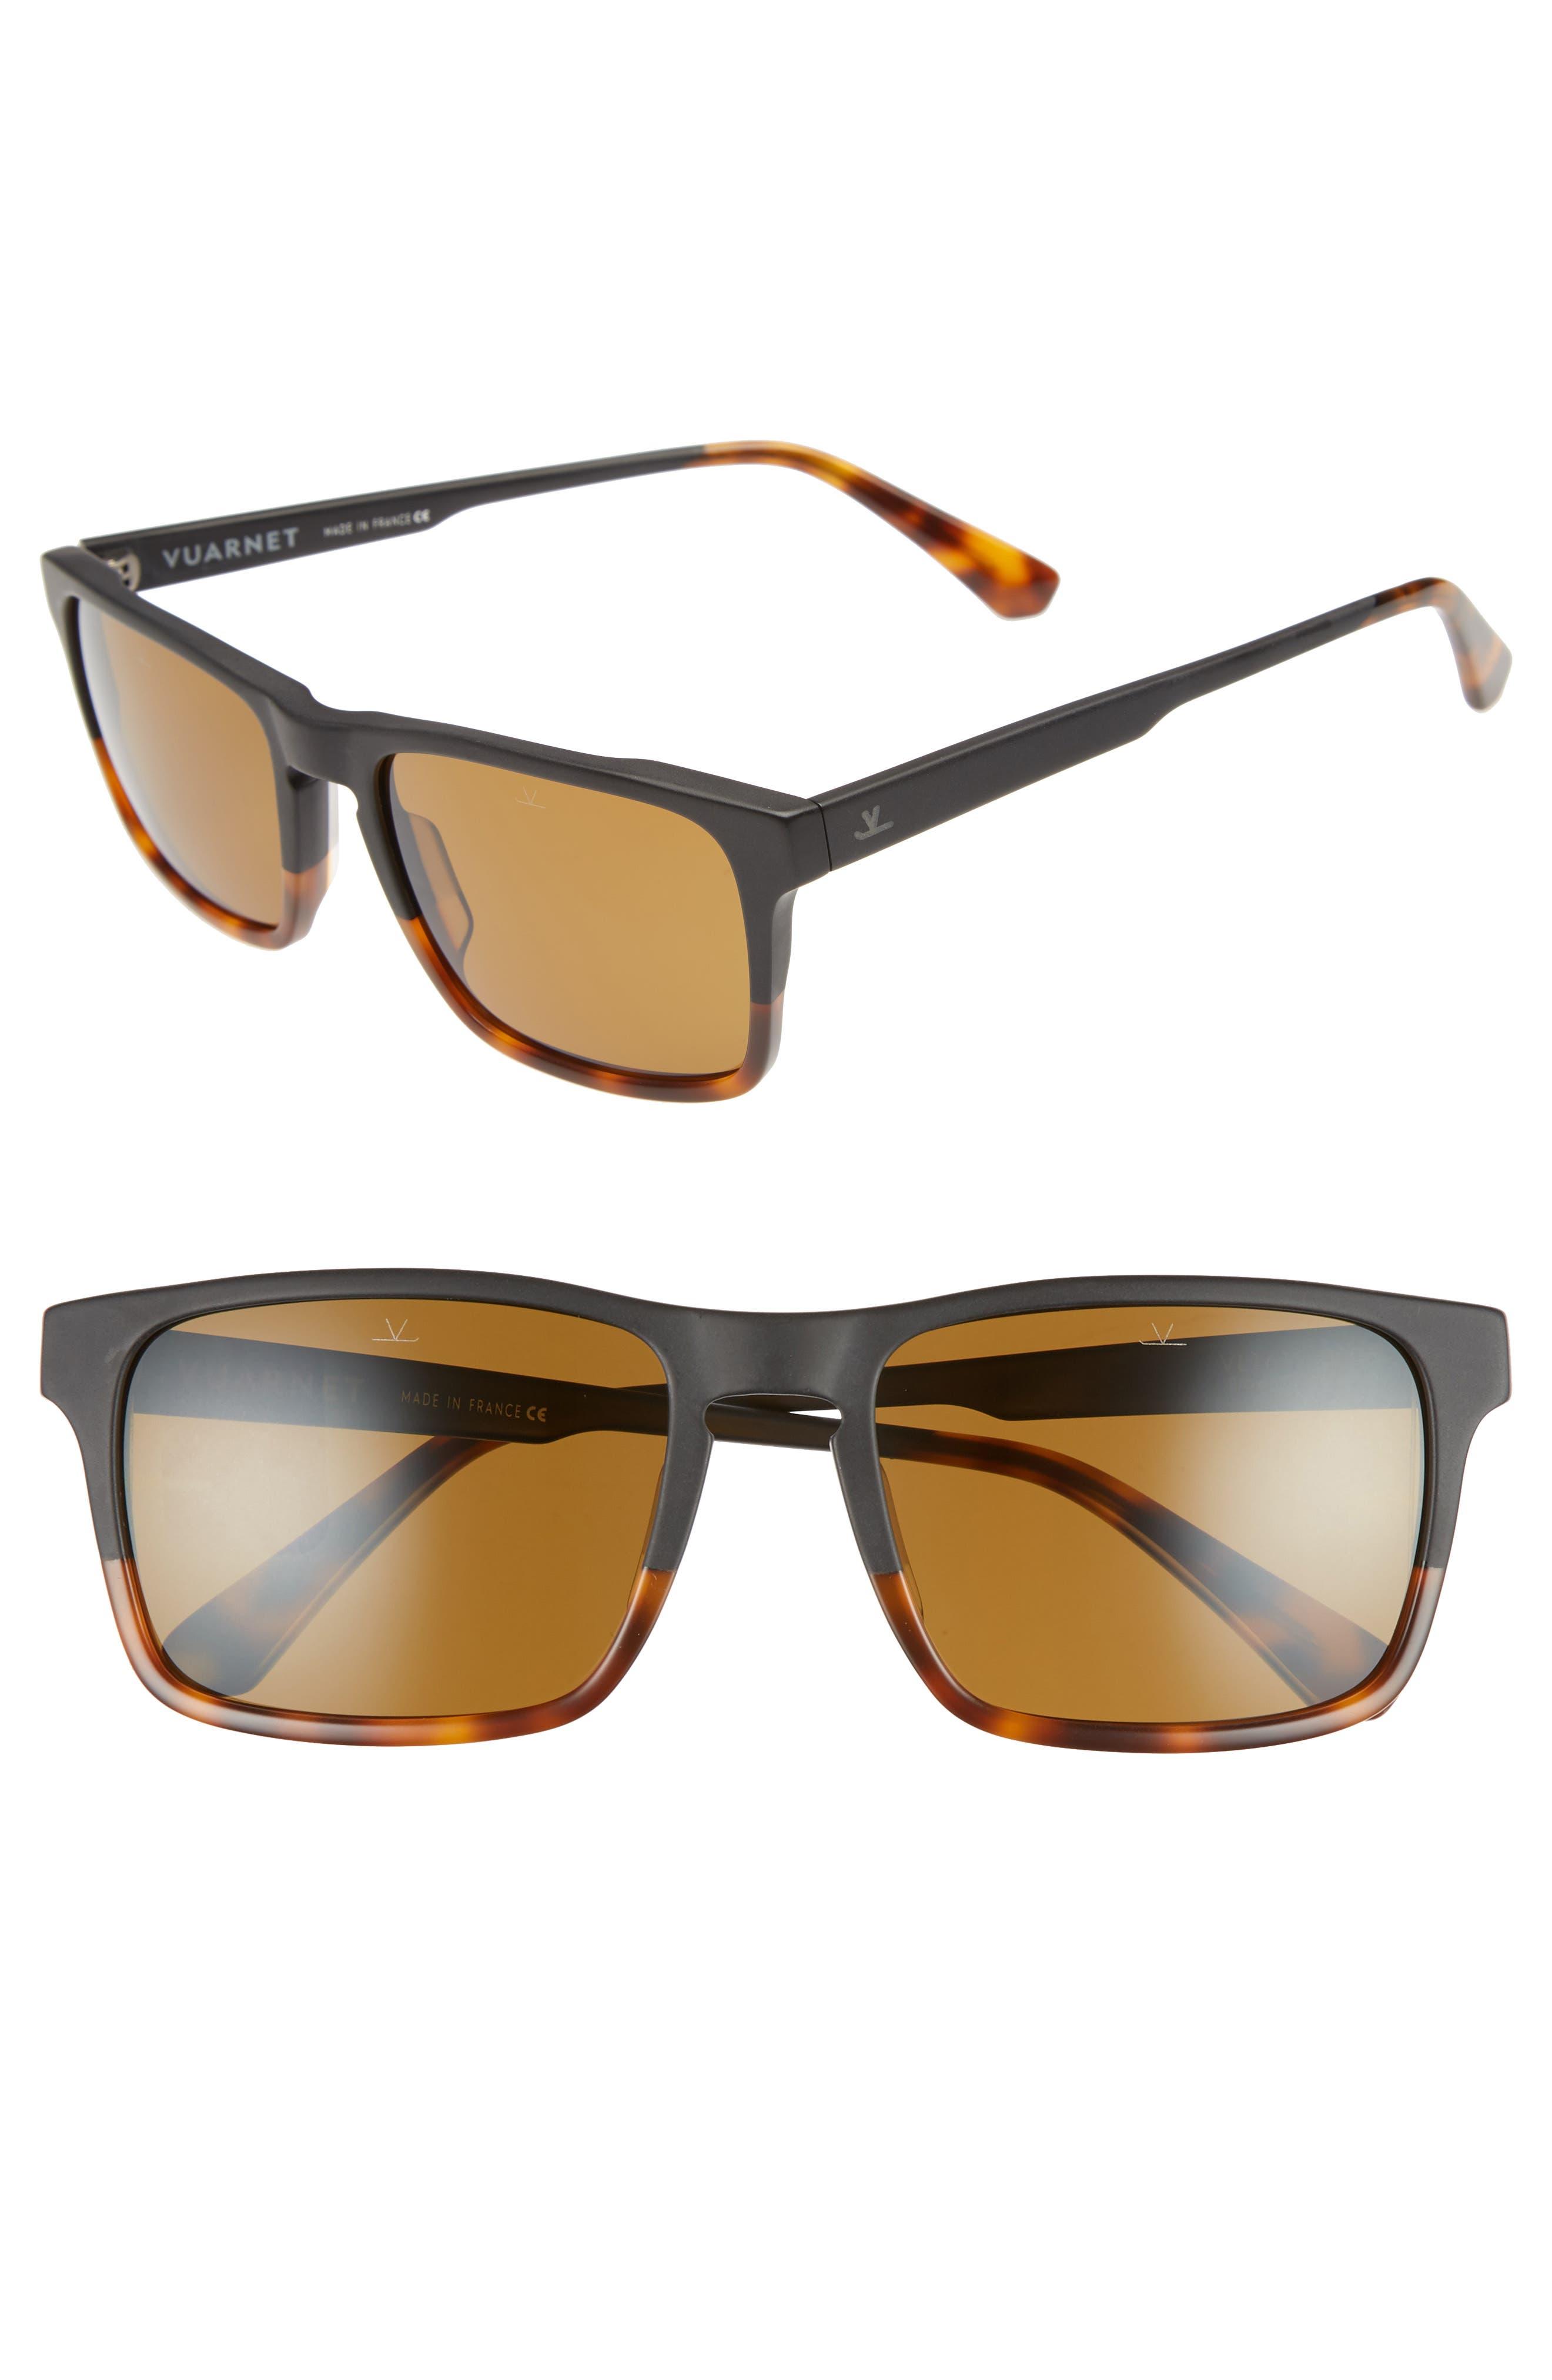 Large District 54mm Sunglasses,                         Main,                         color, Matt Black / Tortoise